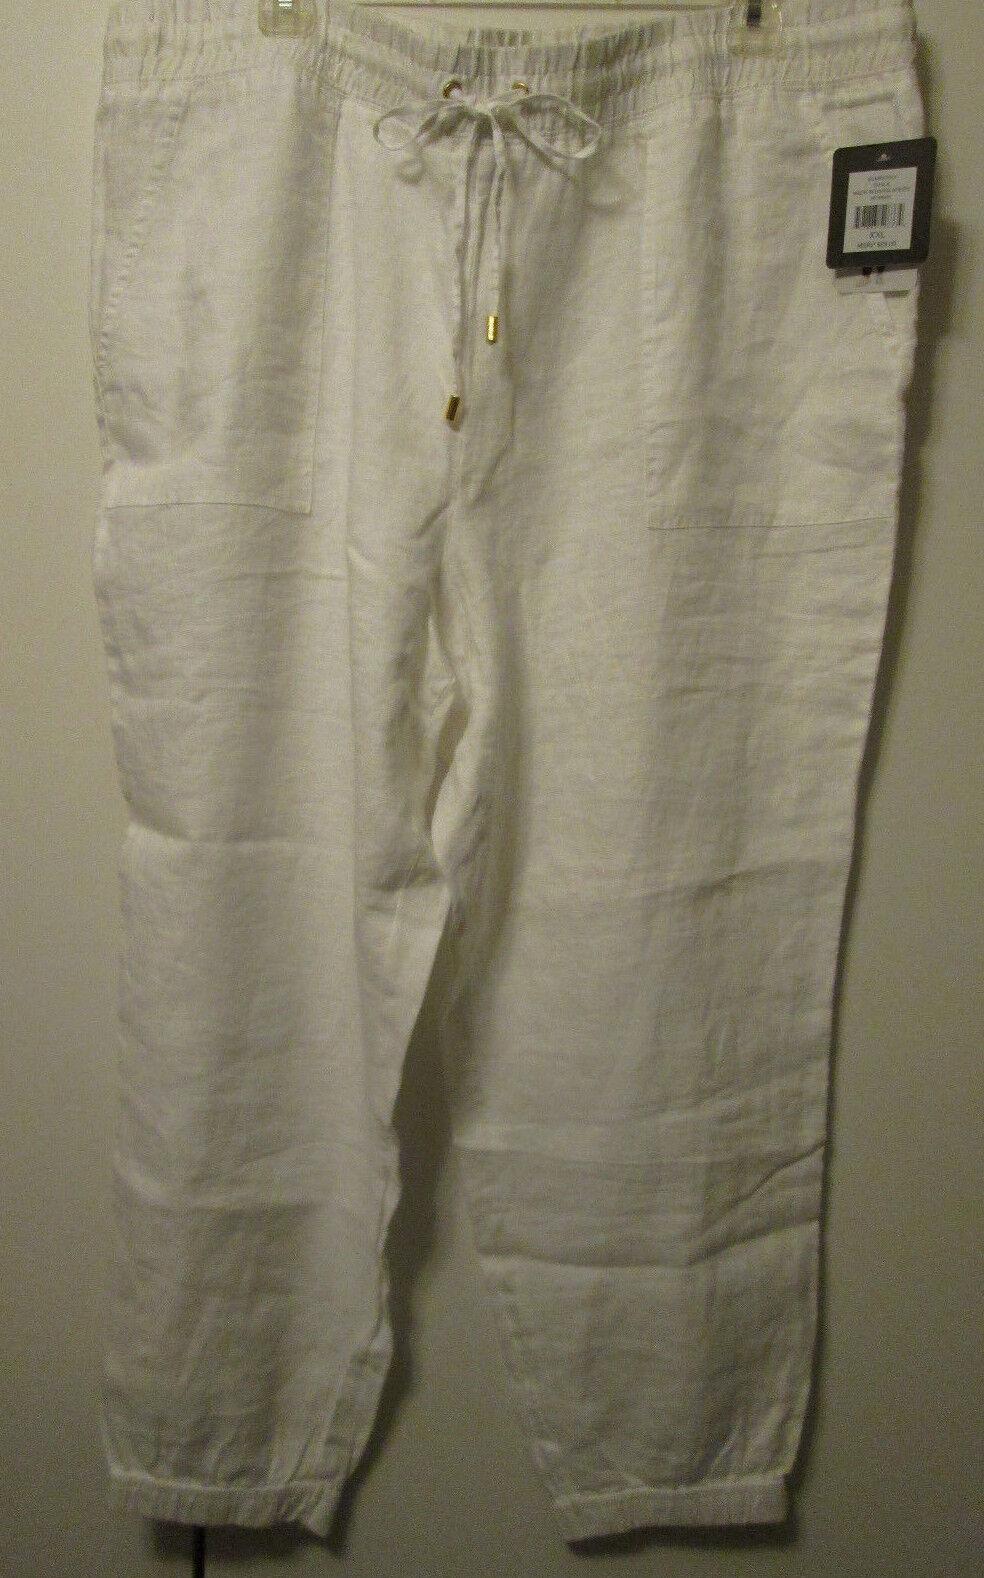 69 Company Ellen Tracy Linen Chalk White Long Cargo Pants Size XXL 2X NWT